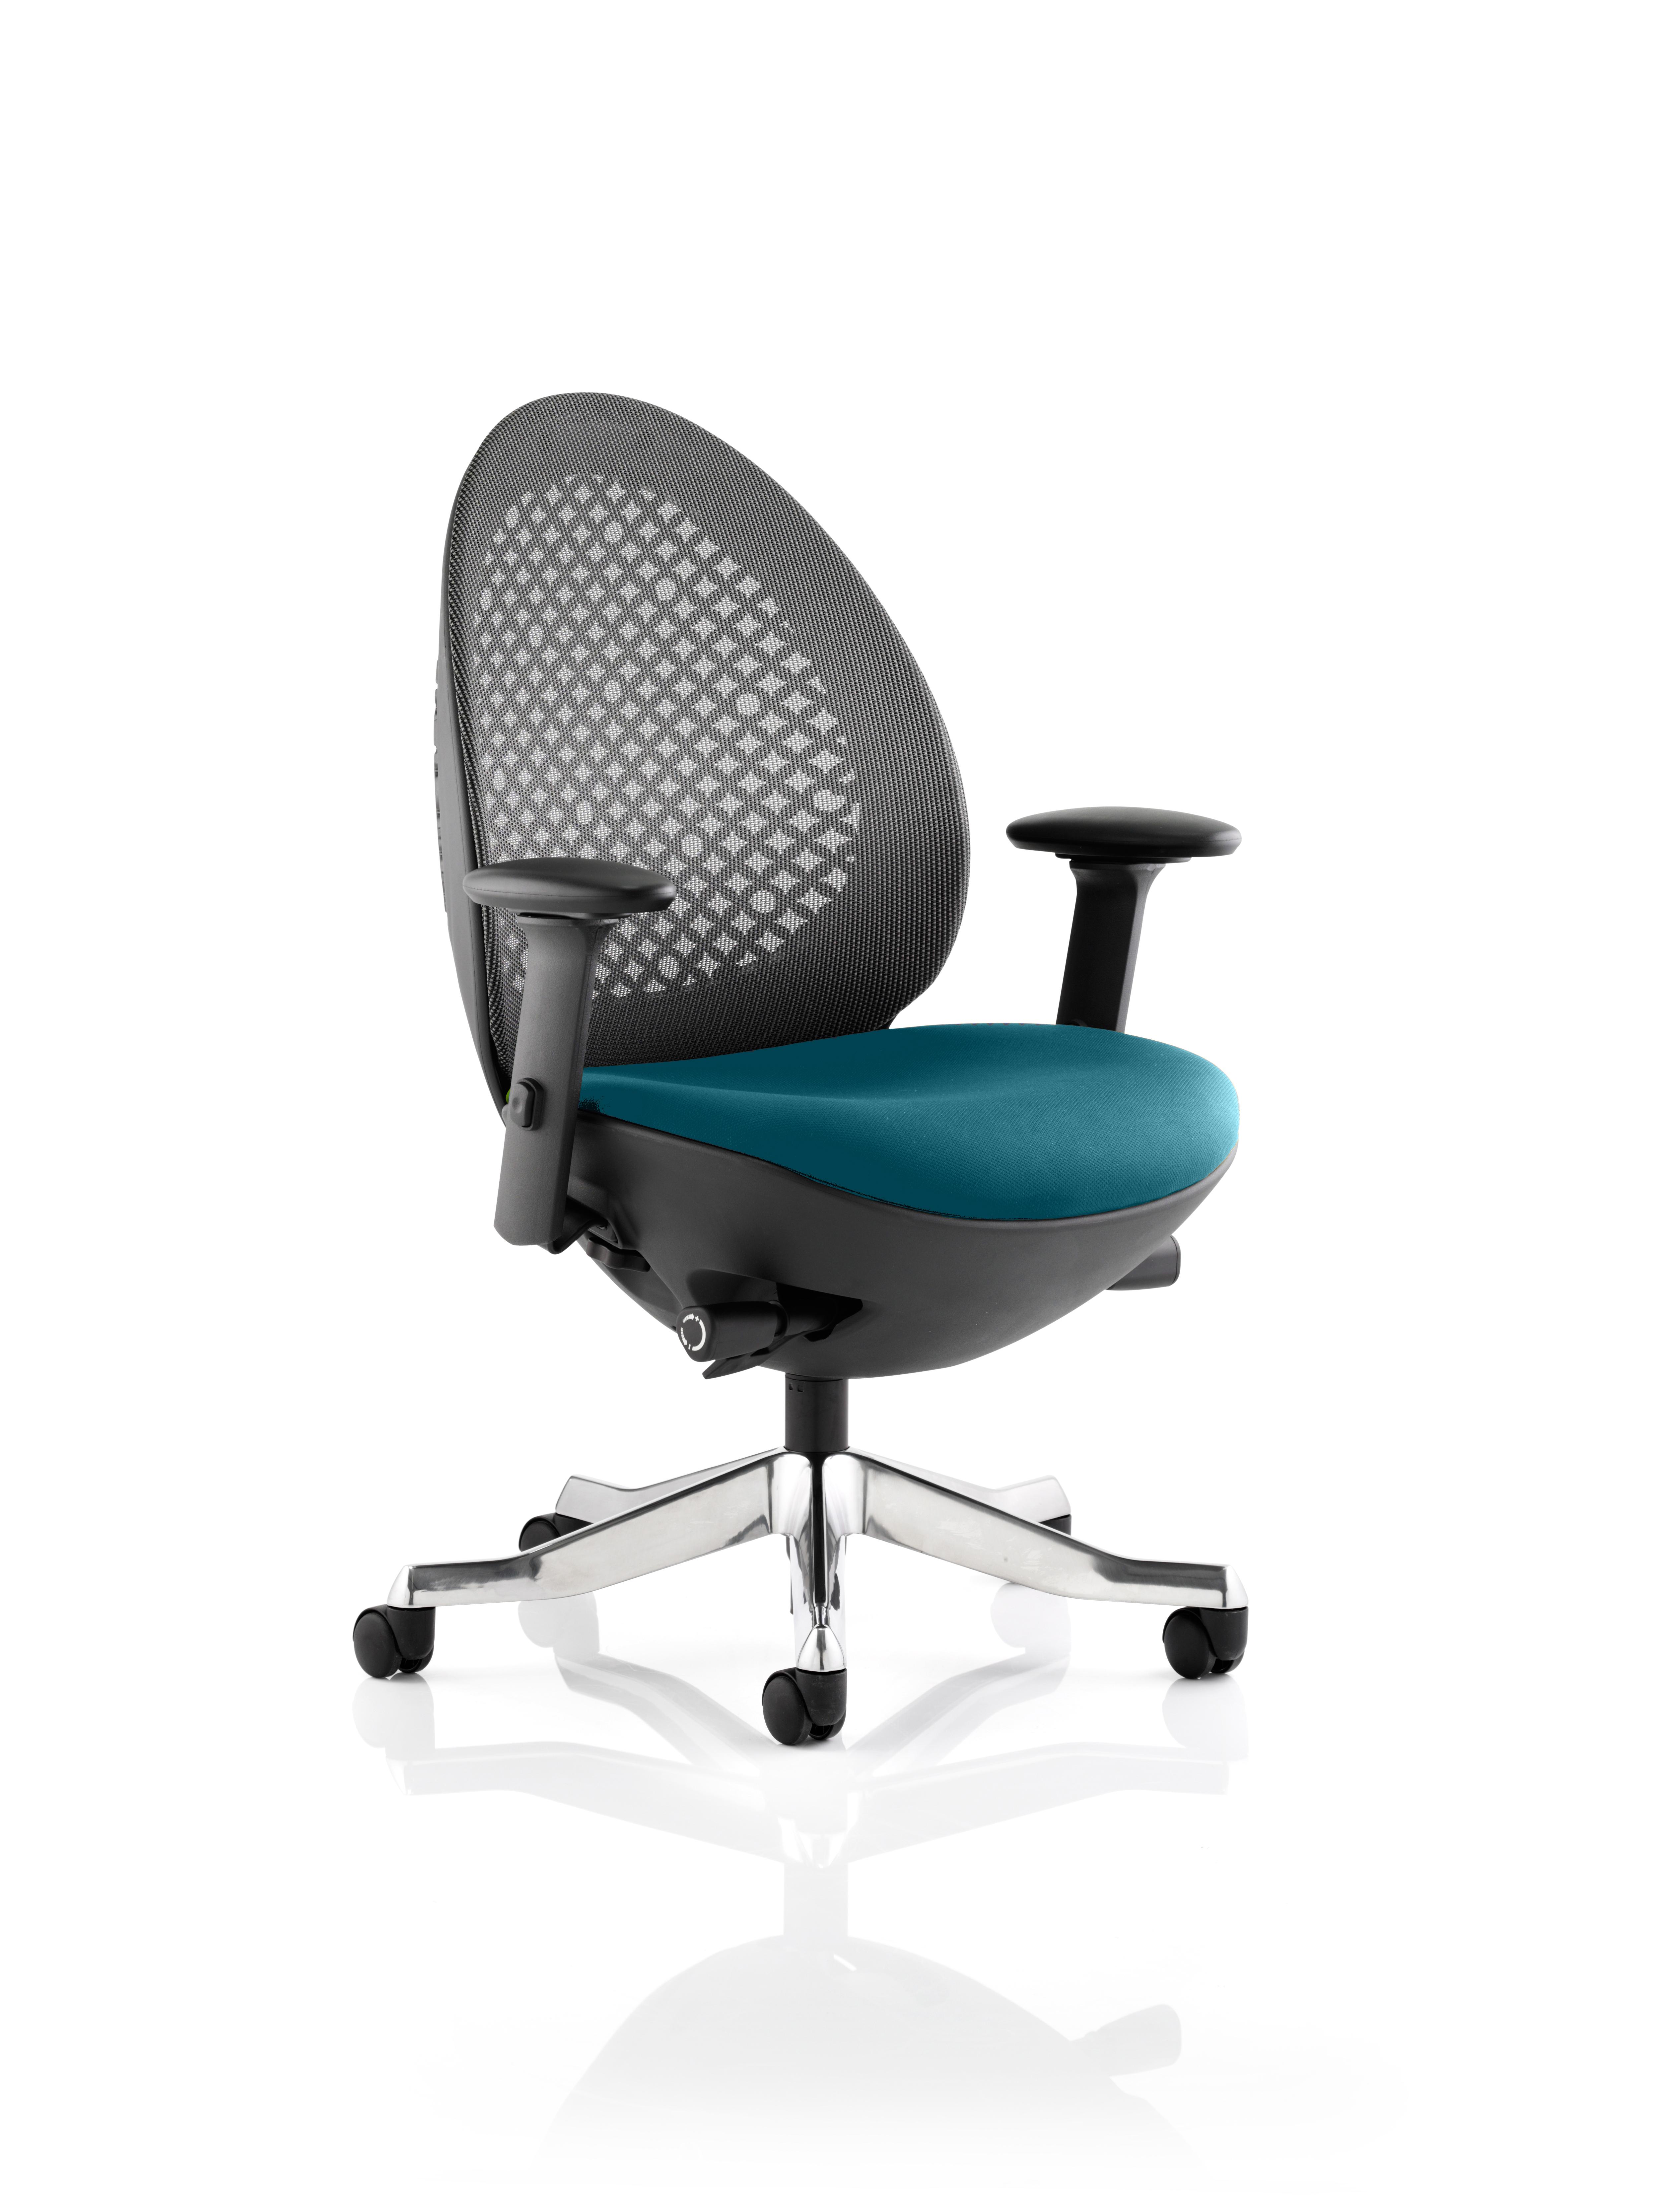 Revo Bespoke Colour Seat In Maringa Teal